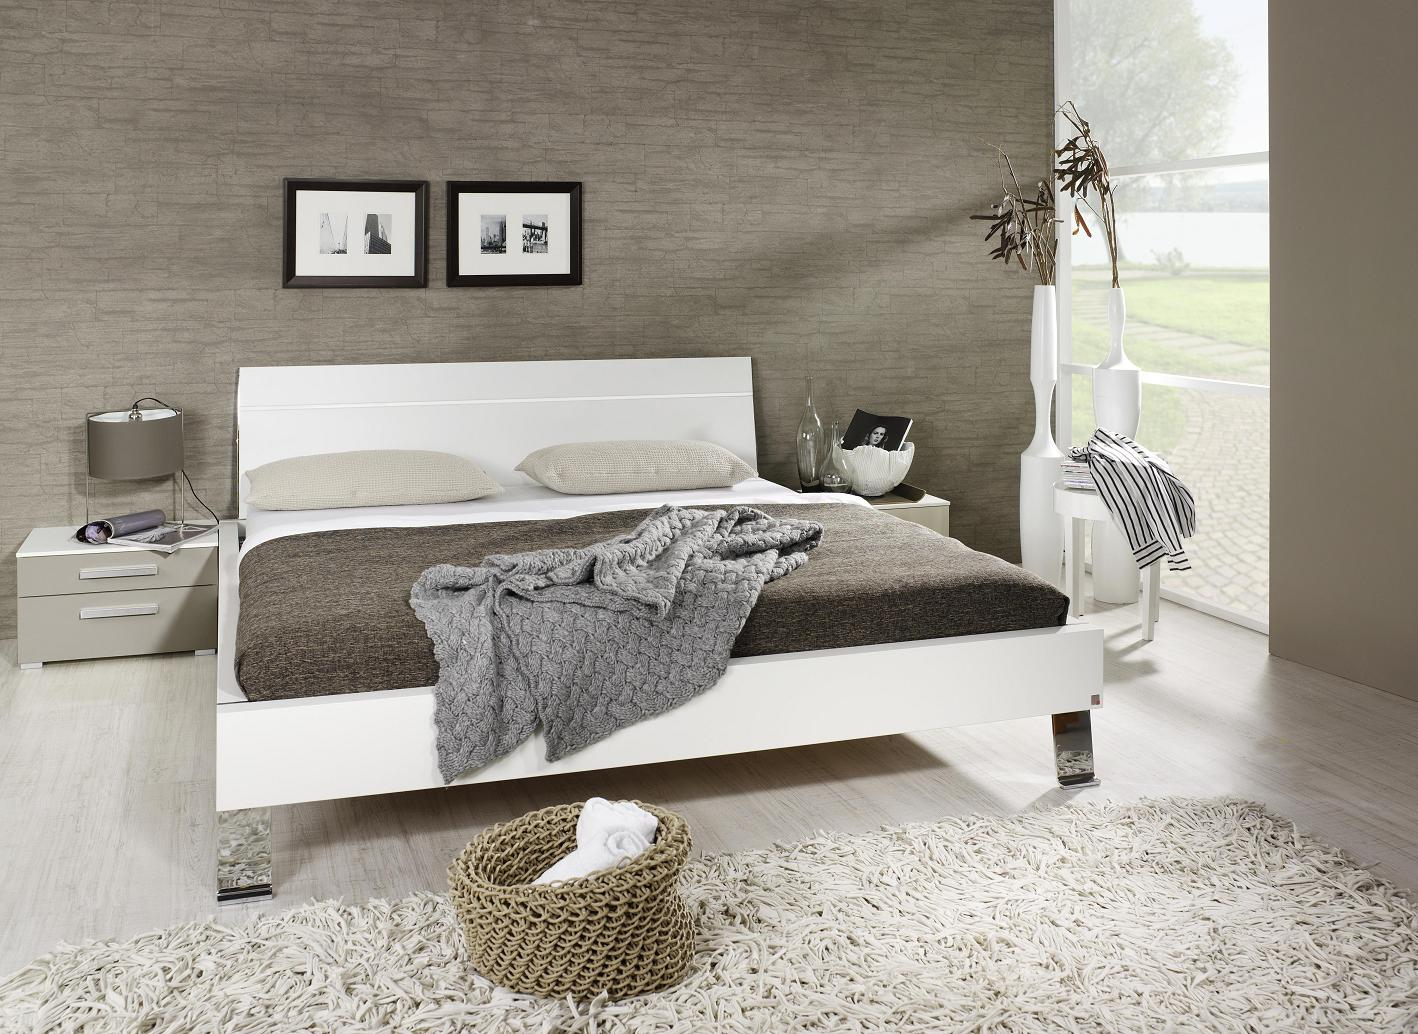 bett 180x220 amazing topmatras x schn matratzen topper hart bestes bett und matratze with bett. Black Bedroom Furniture Sets. Home Design Ideas